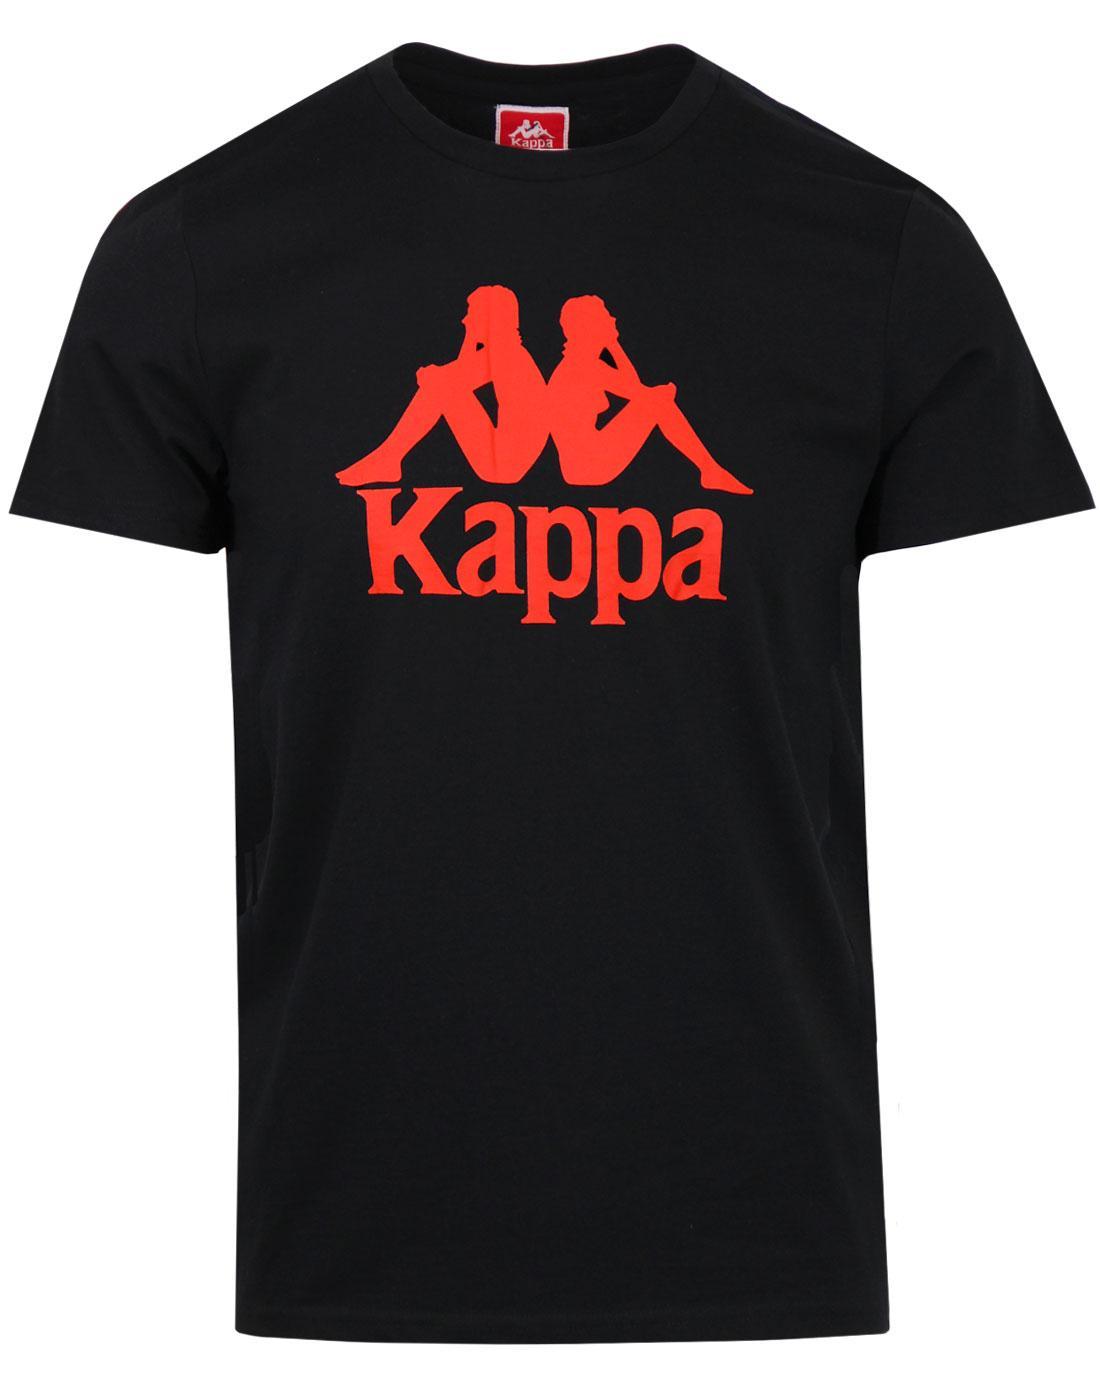 Estessi KAPPA Retro 80s Omni Logo T-shirt BLACK